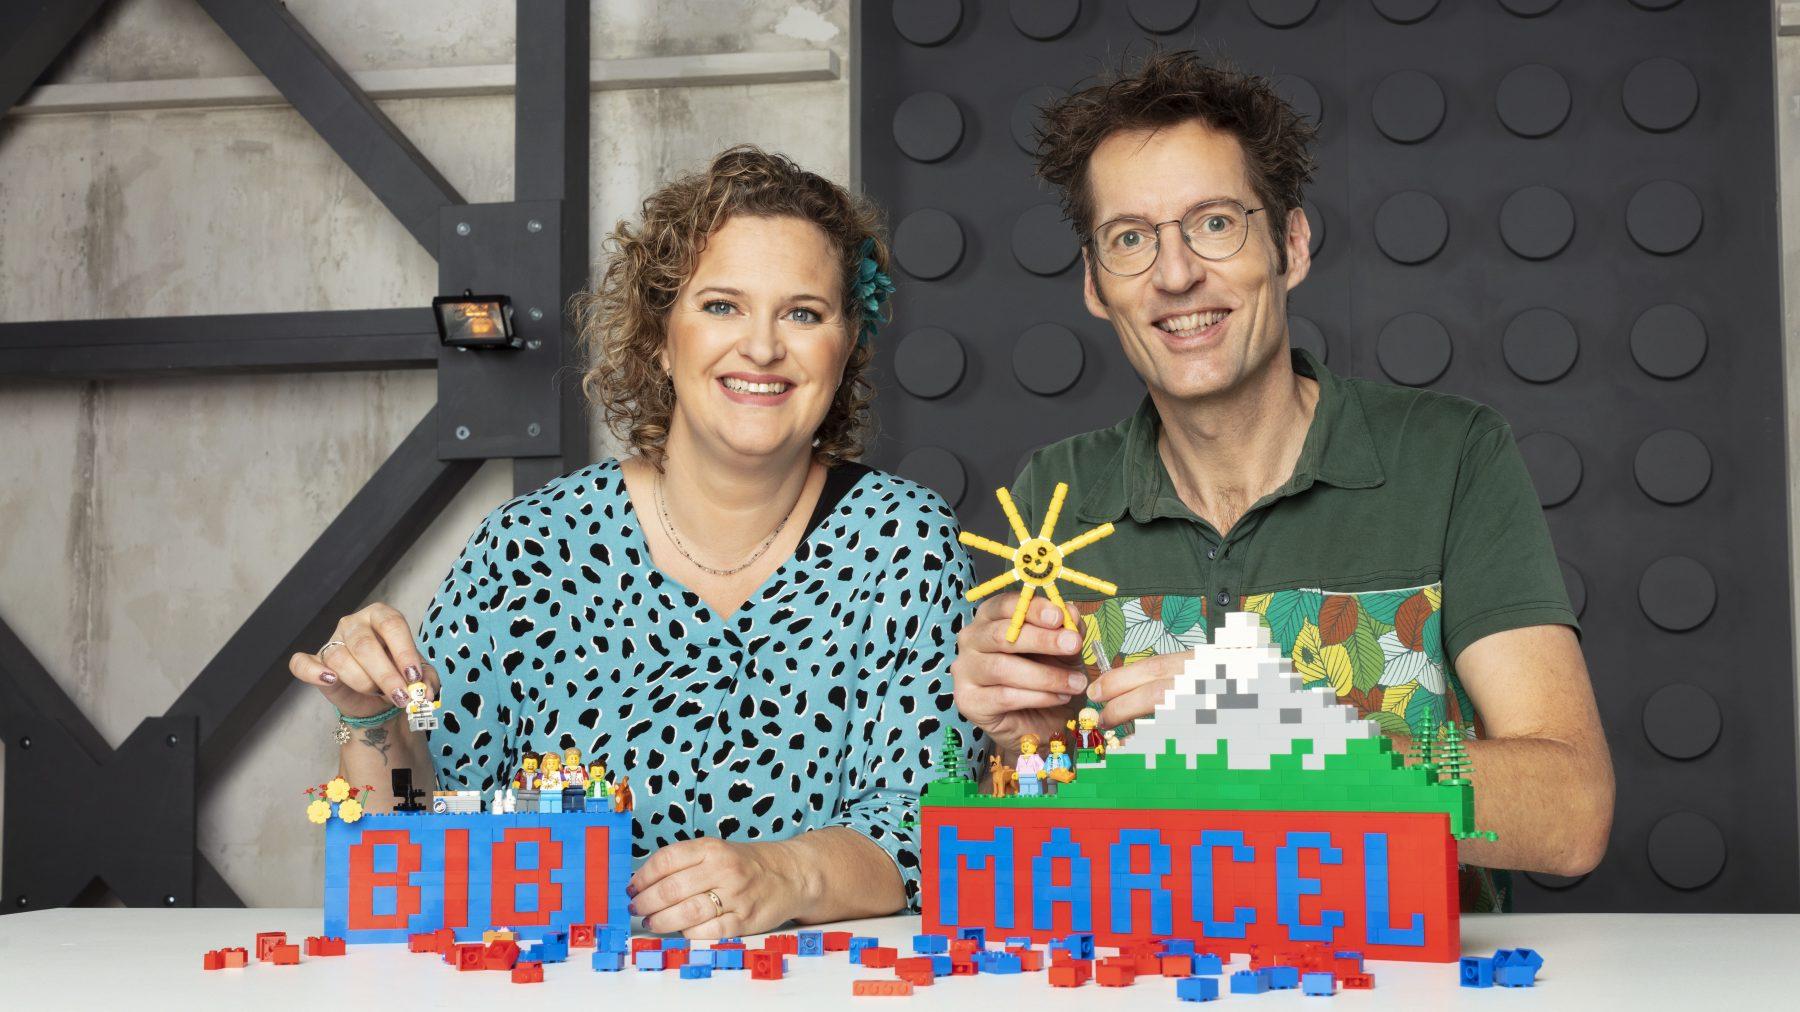 Bibi Werter Lego Masters